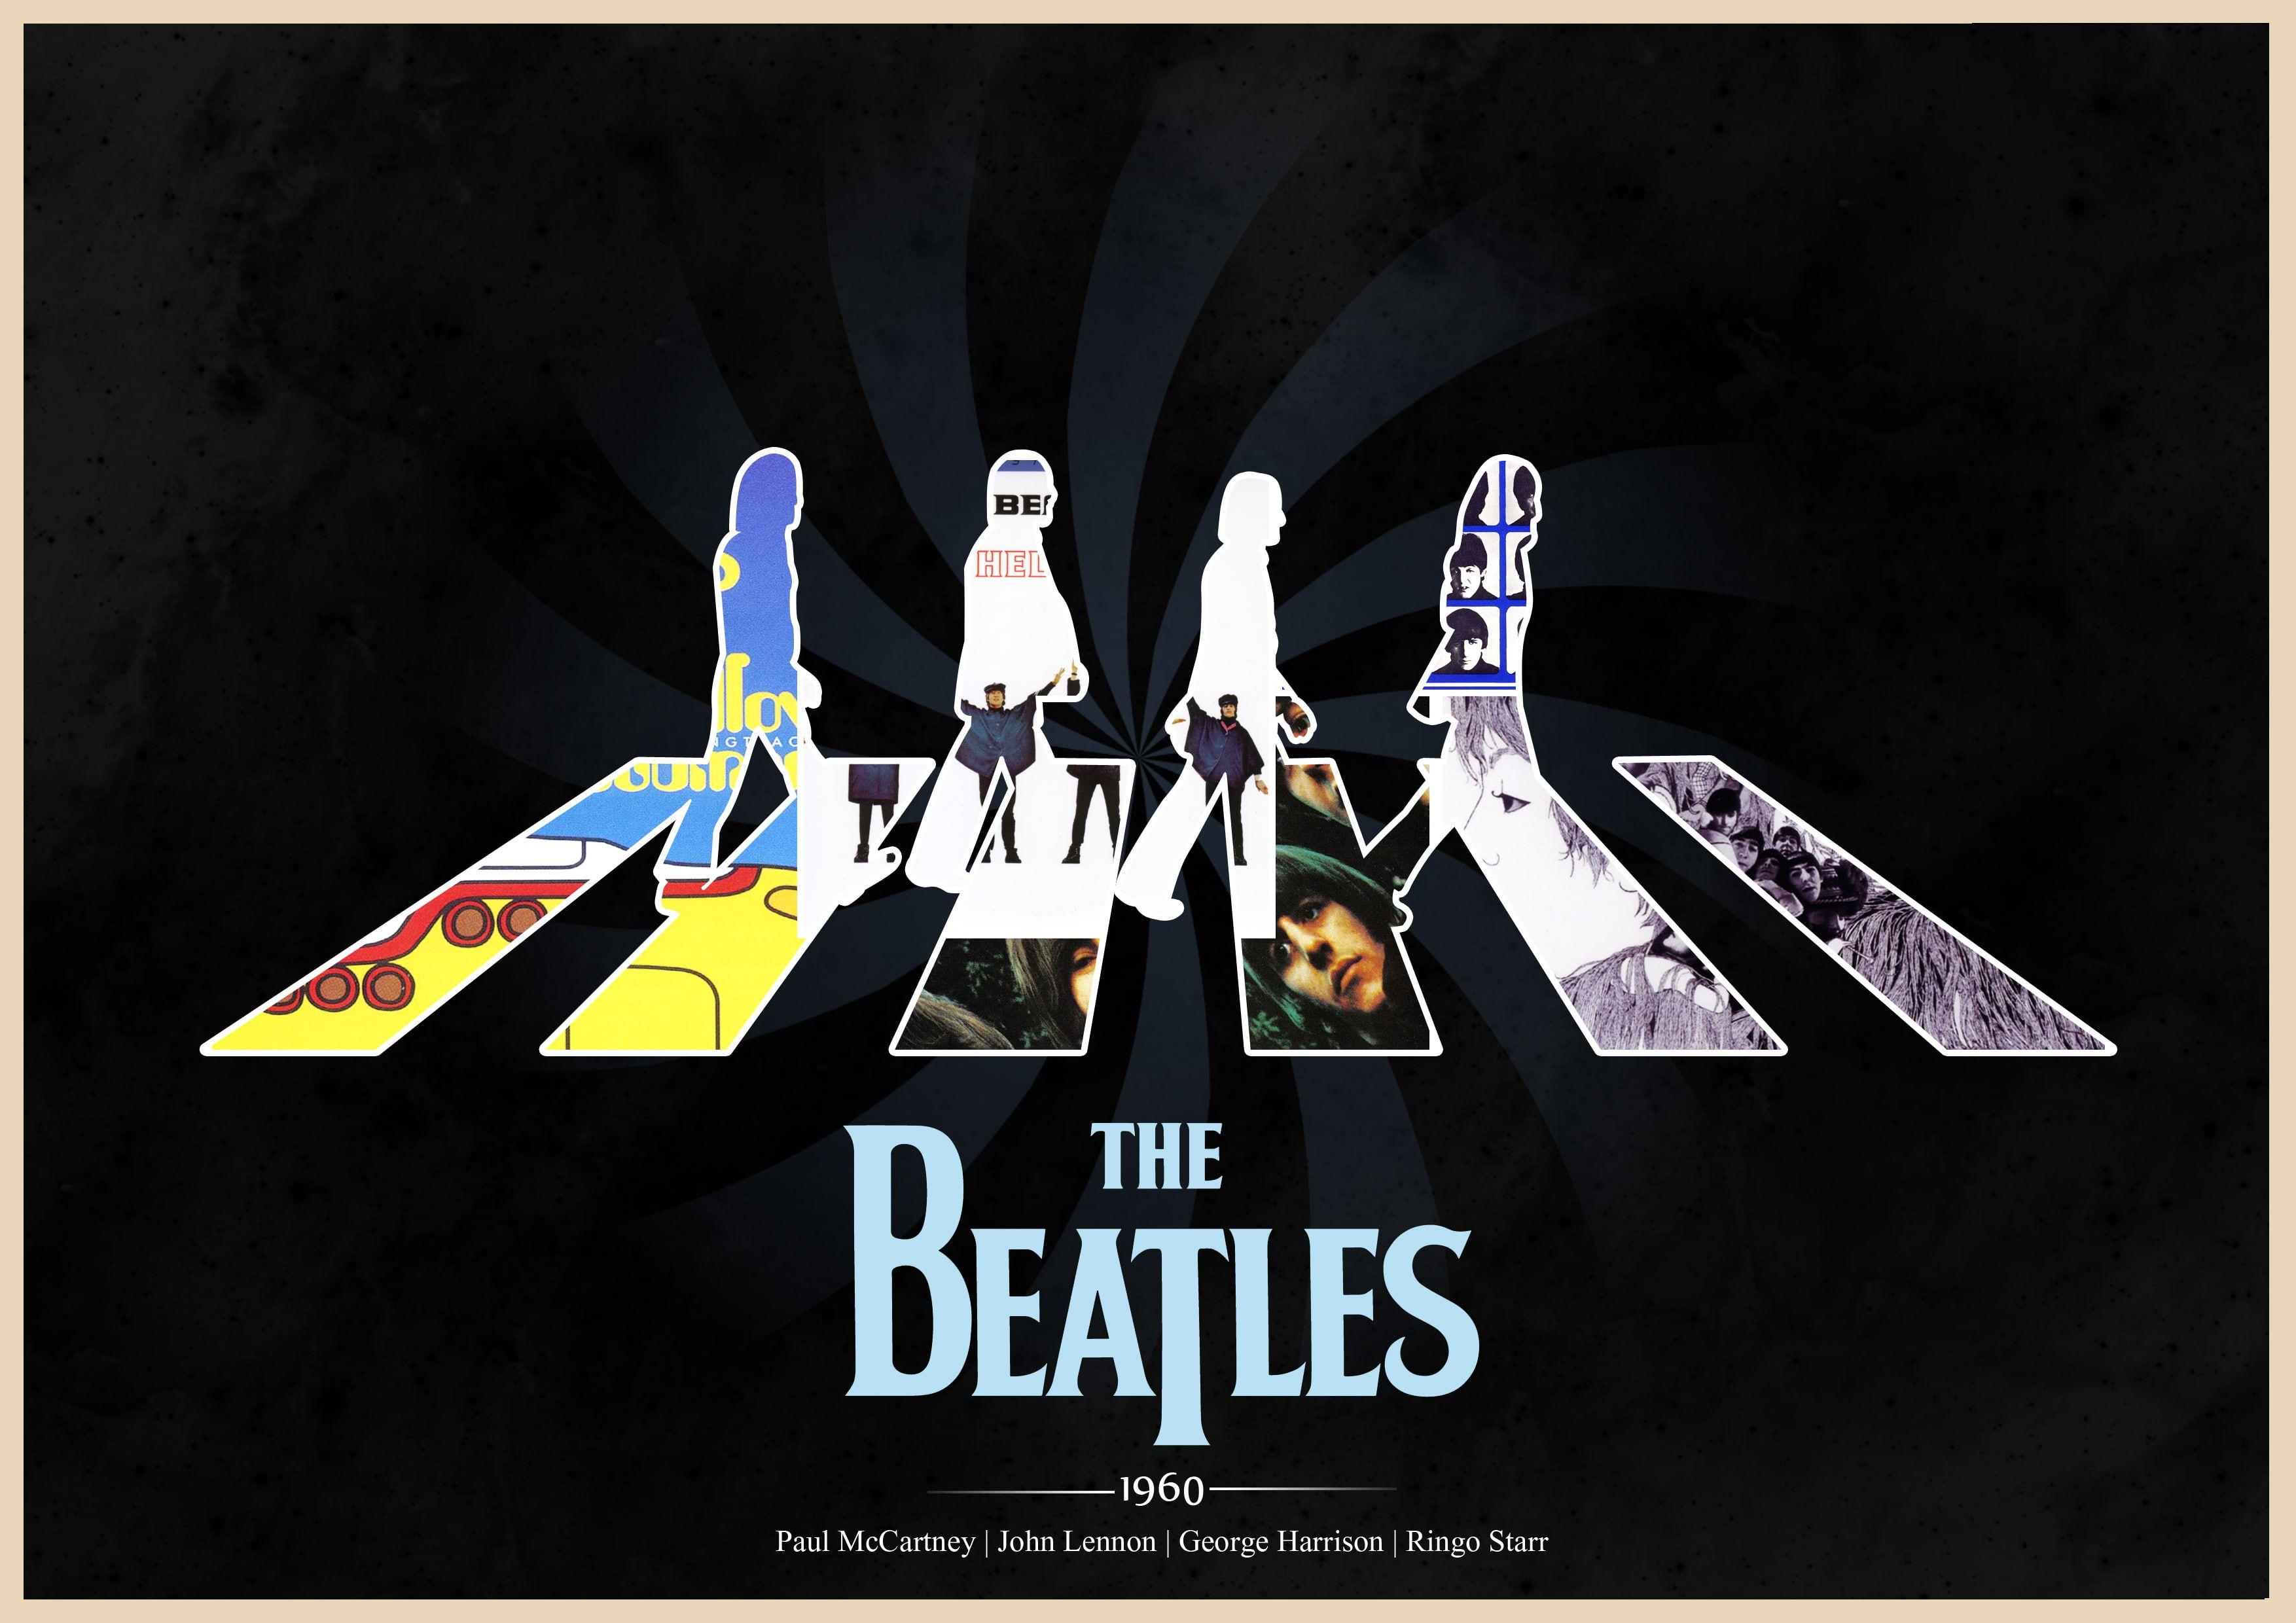 The Beatles Abbey Road Wallpaper Abbey Road The Beatles Rock Paul Mccartney John Lennon Album Covers Ring Beatles Wallpaper Beatles Poster John Lennon Beatles